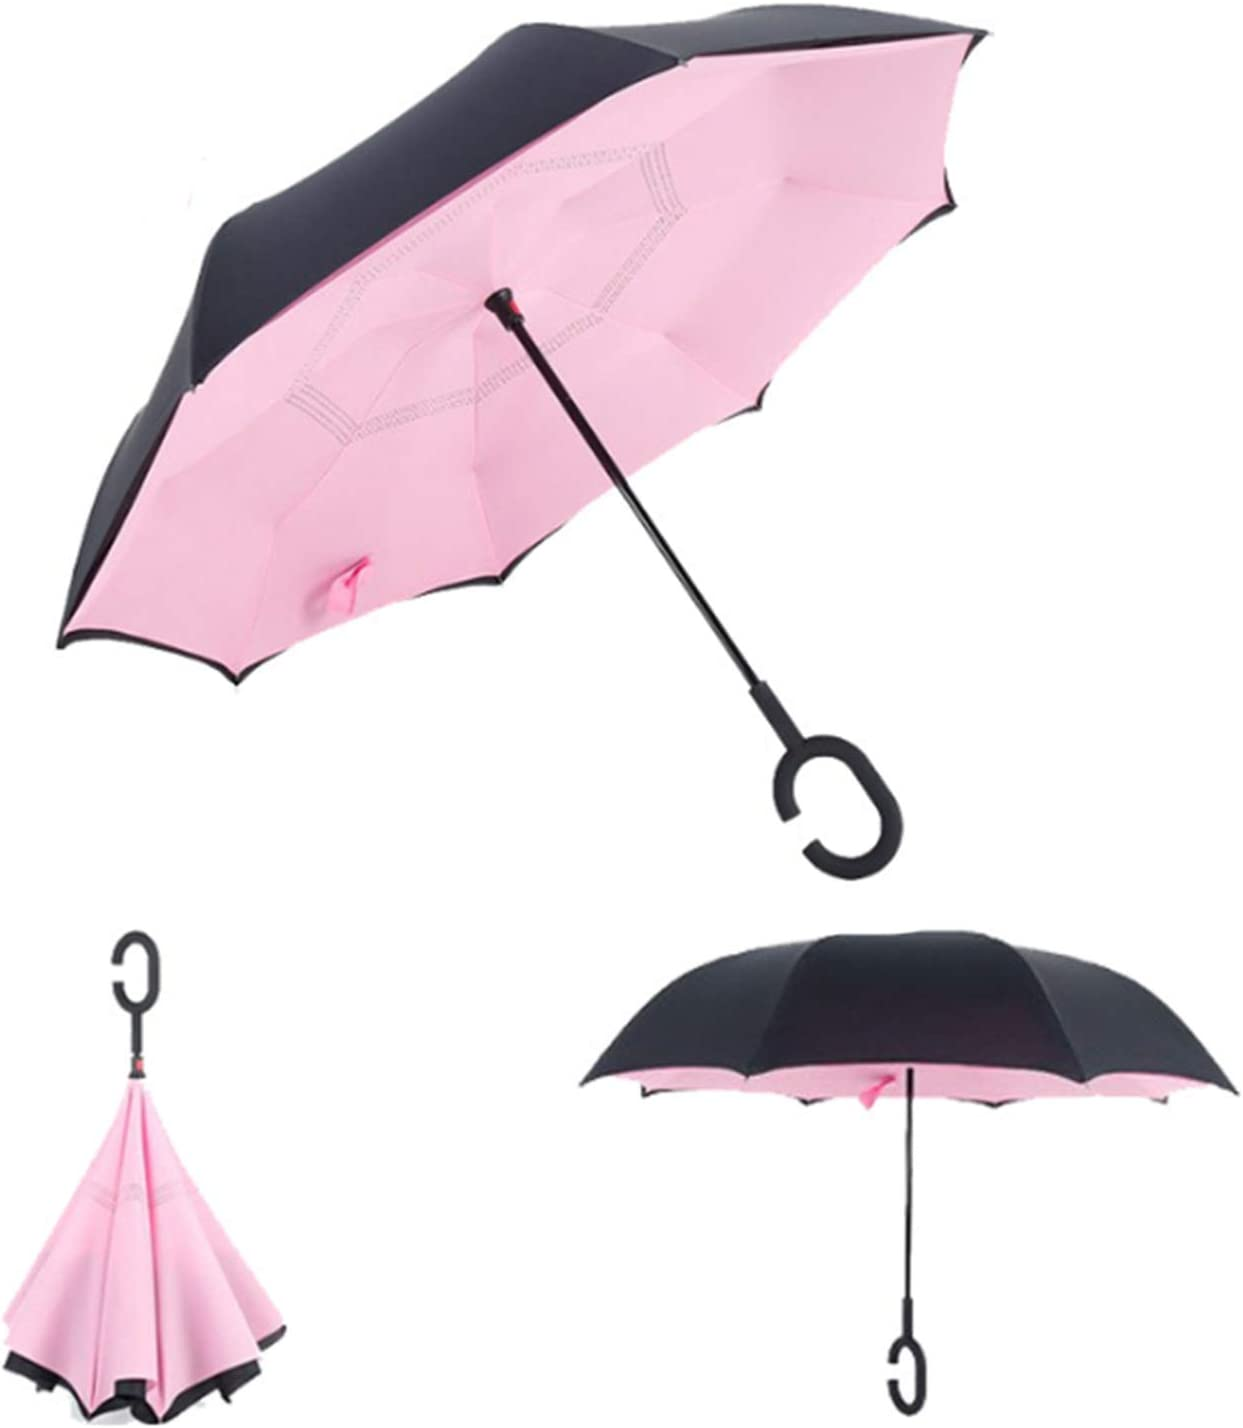 DropShipping Folding Reverse Umbrella Double Layer Inverted Windproof Rain Car Umbrellas For Women Man,Sunflower